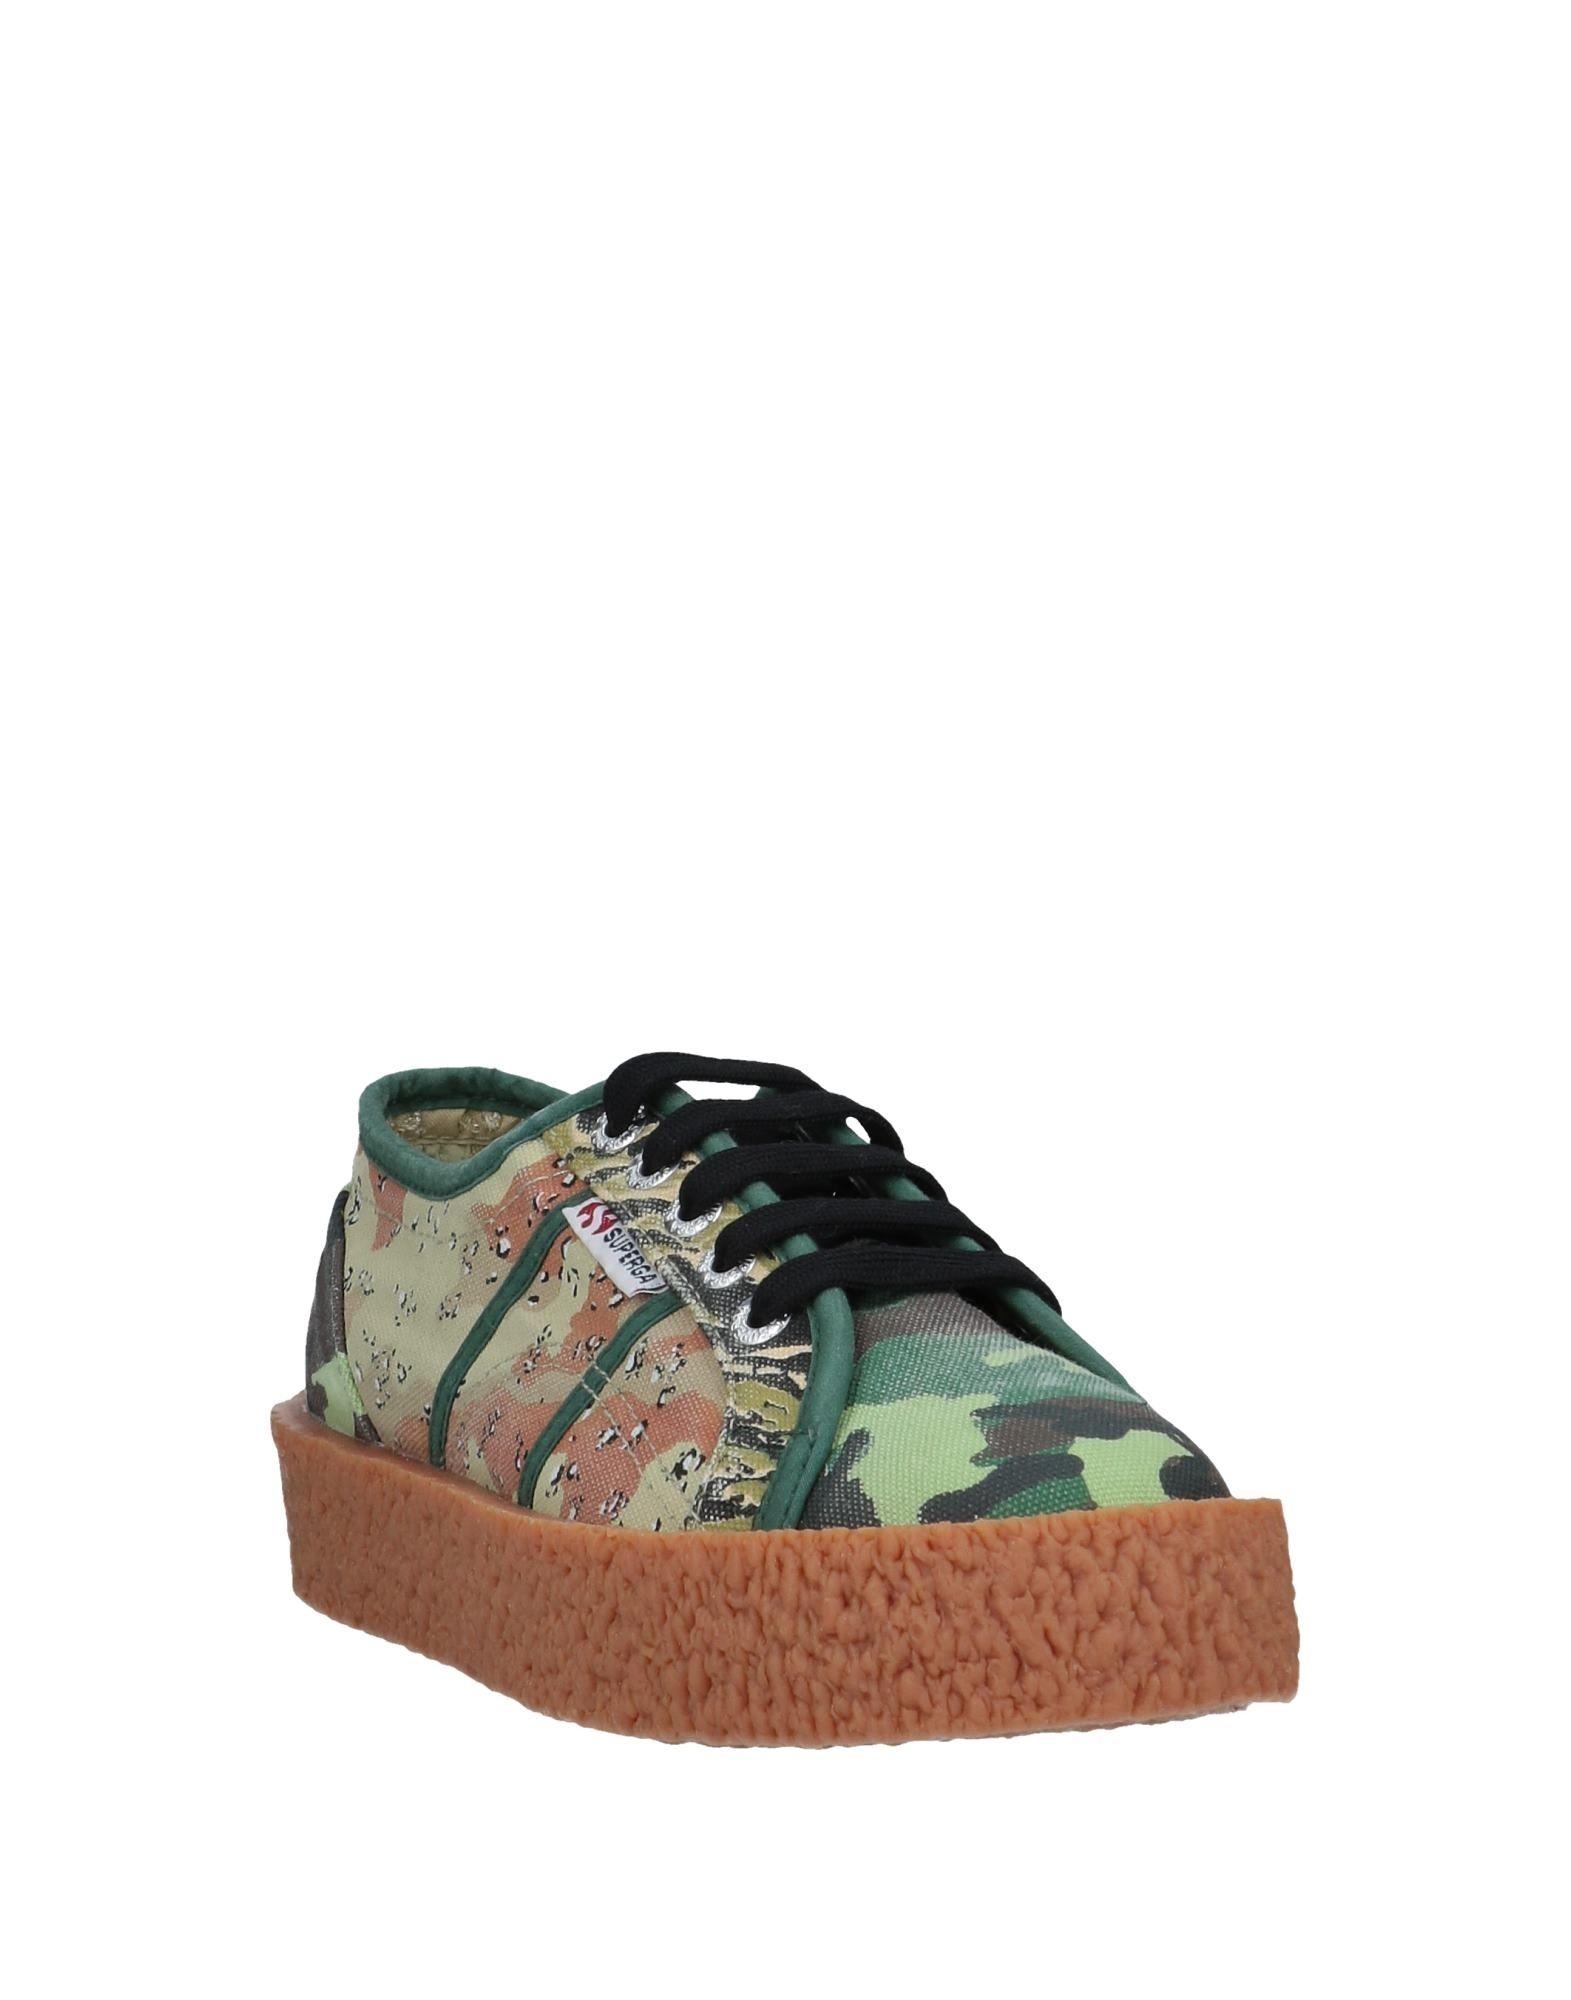 Superga® Sneakers Damen  beliebte 11548384WN Gute Qualität beliebte  Schuhe 2ad7f1